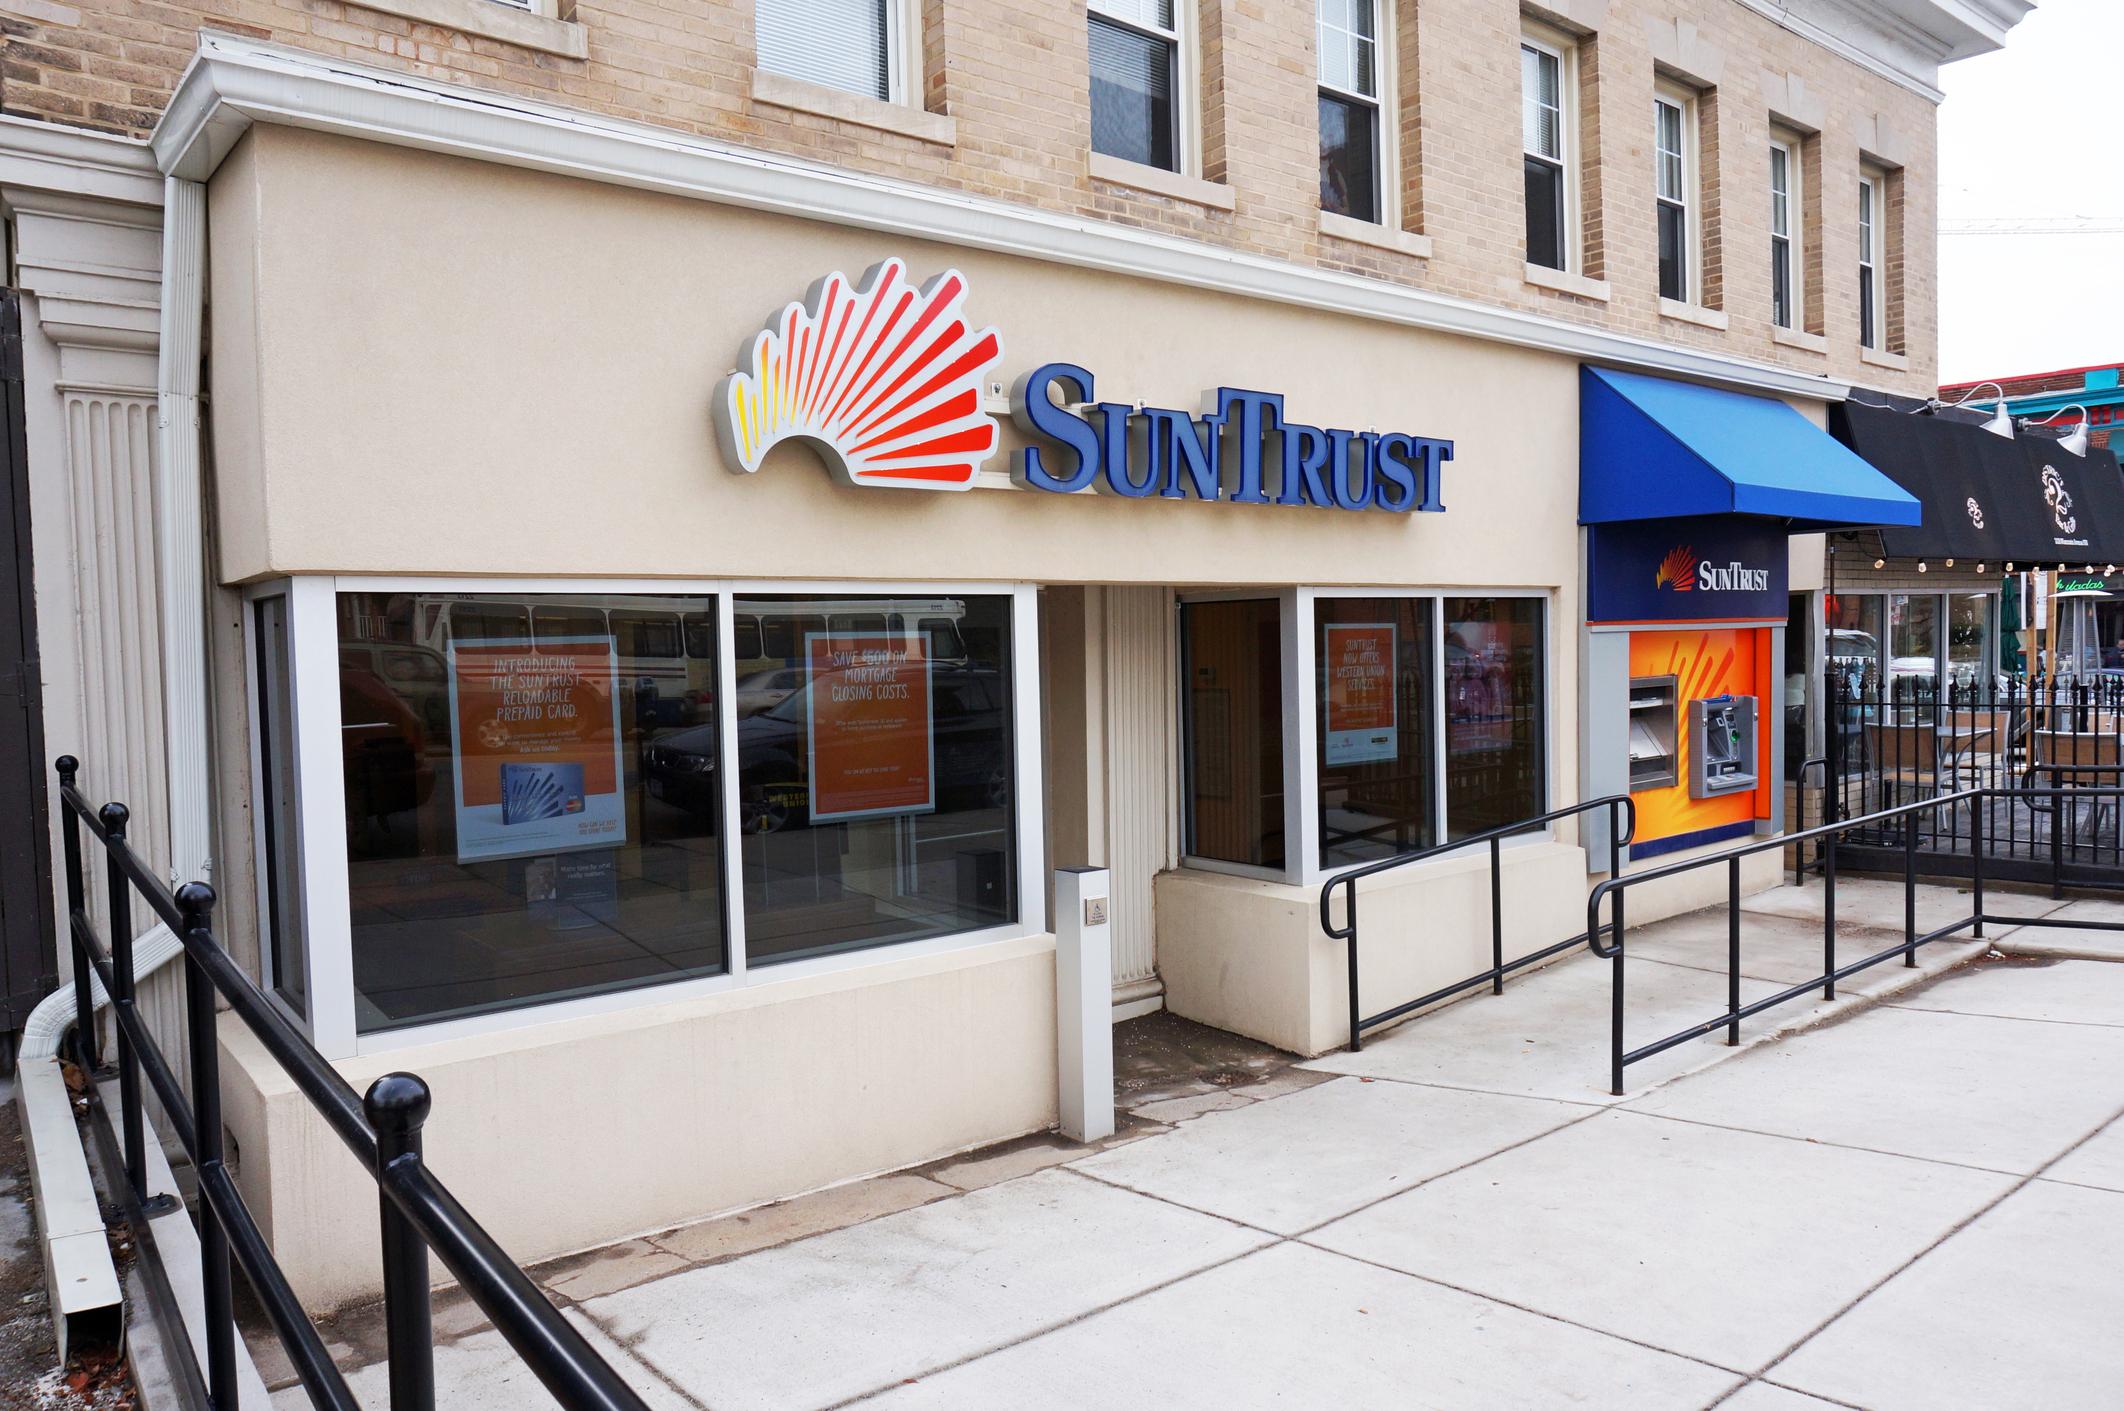 A branch of SunTrust Banks.